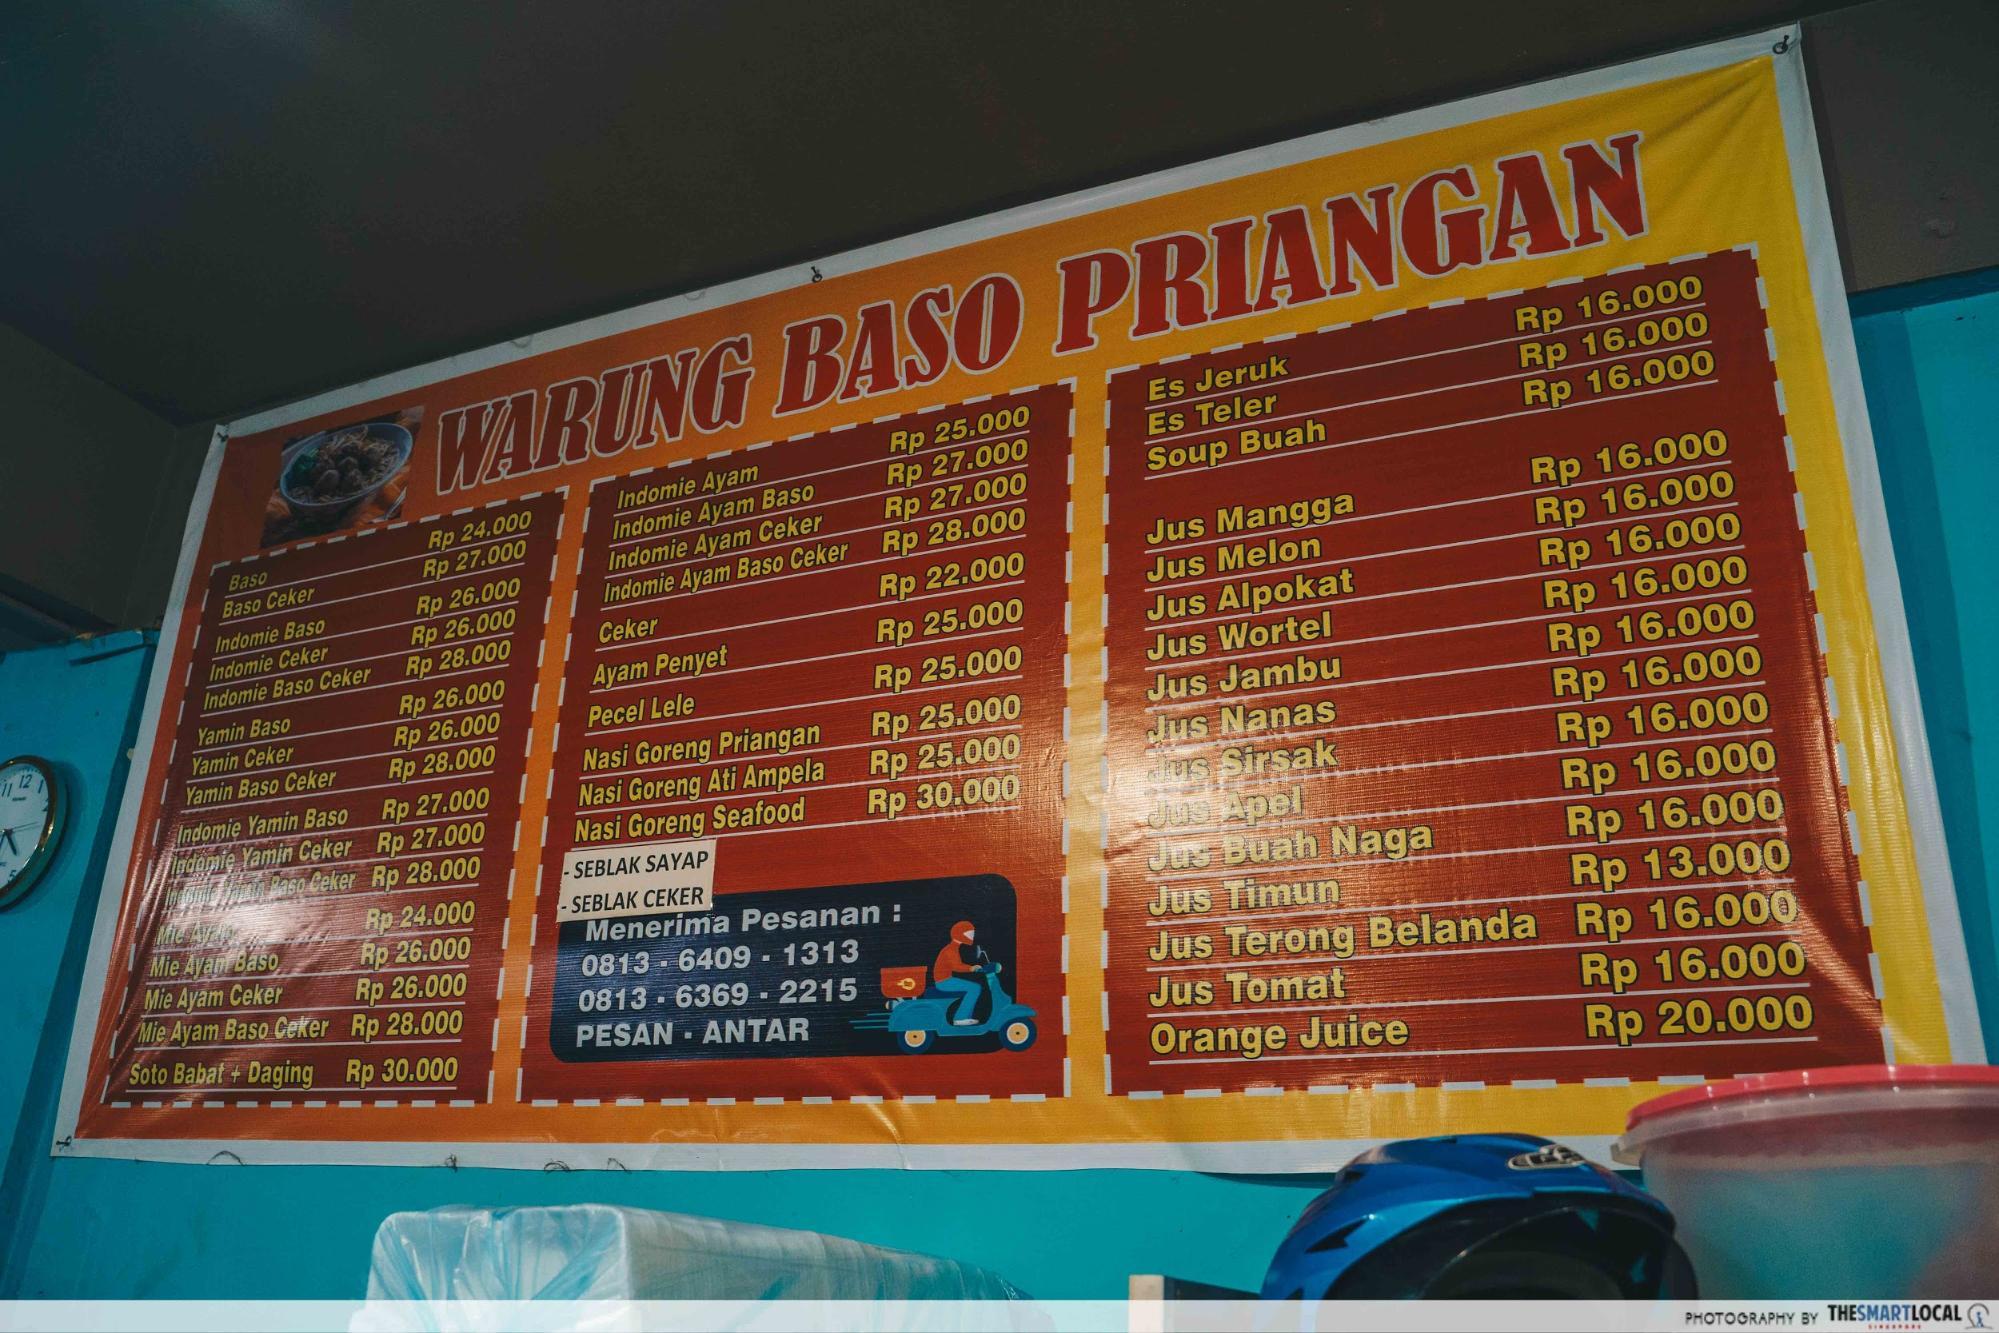 Baso Priangan Batam menu